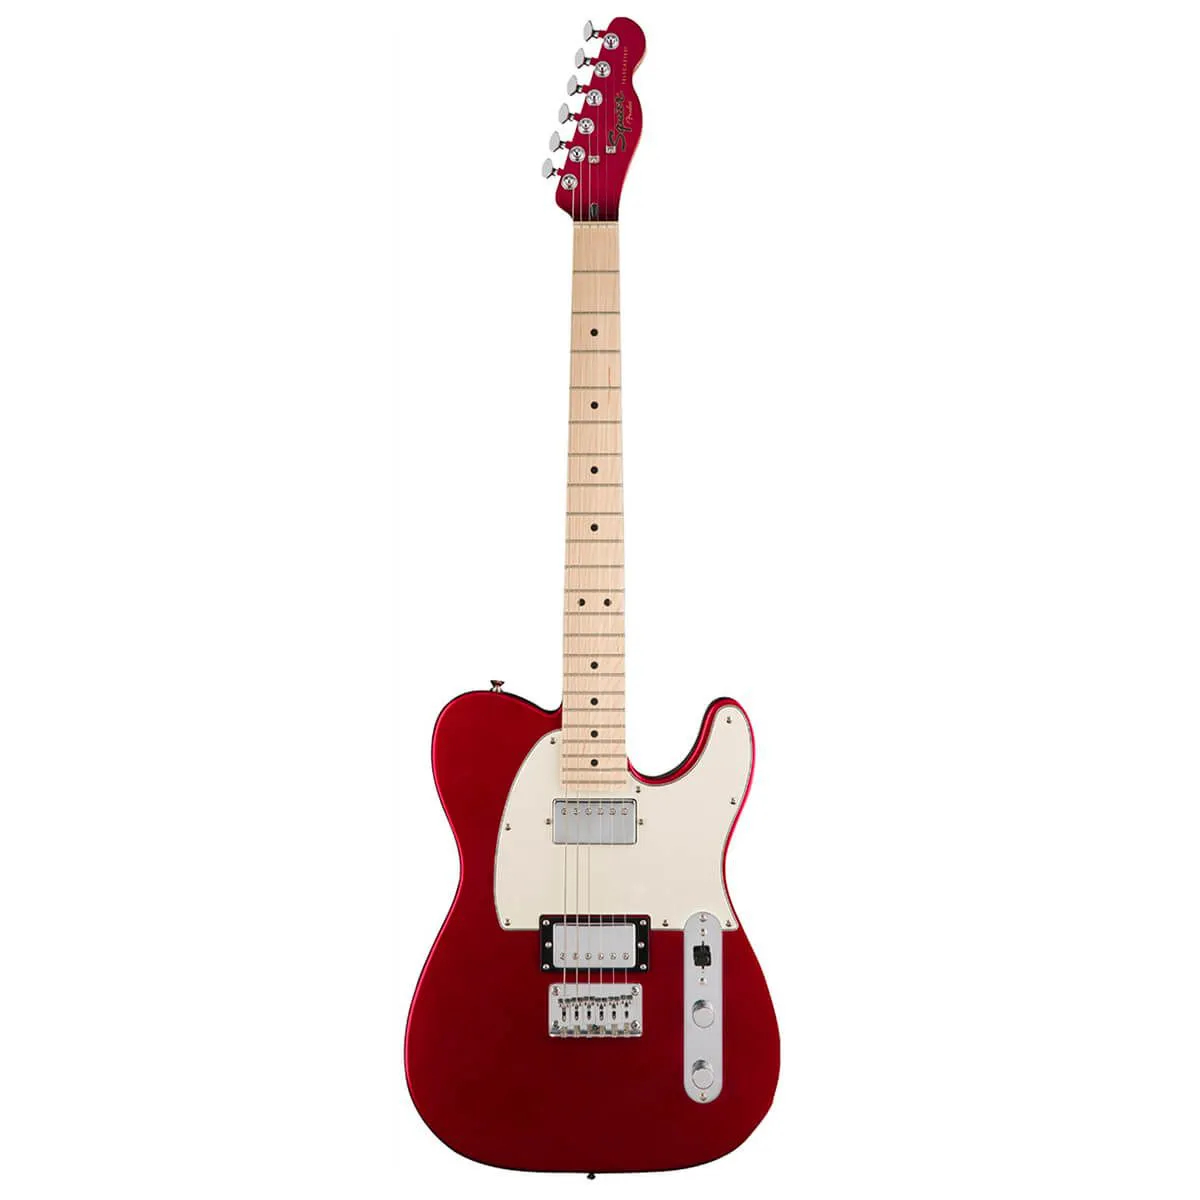 Guitarra Fender Squier Contemporary Telecaster HH MN Dark Metallic Red